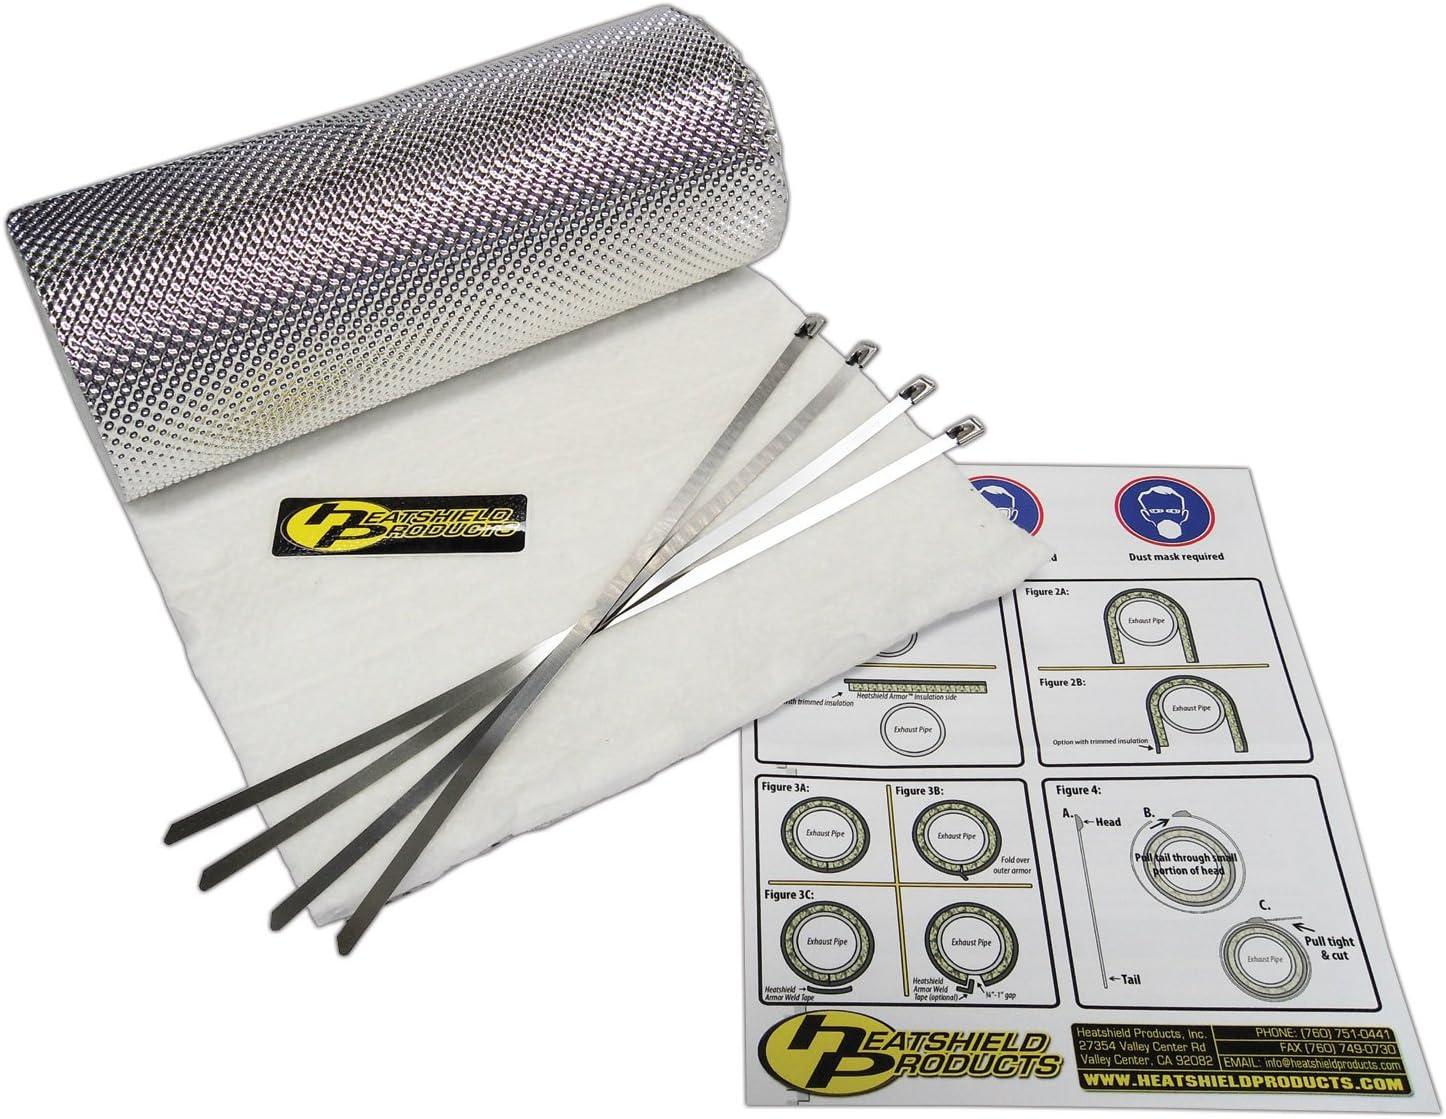 Heatshield Products 177102 Muffler Armor 14 x 20 x 1//4 Thick 2 Sheets